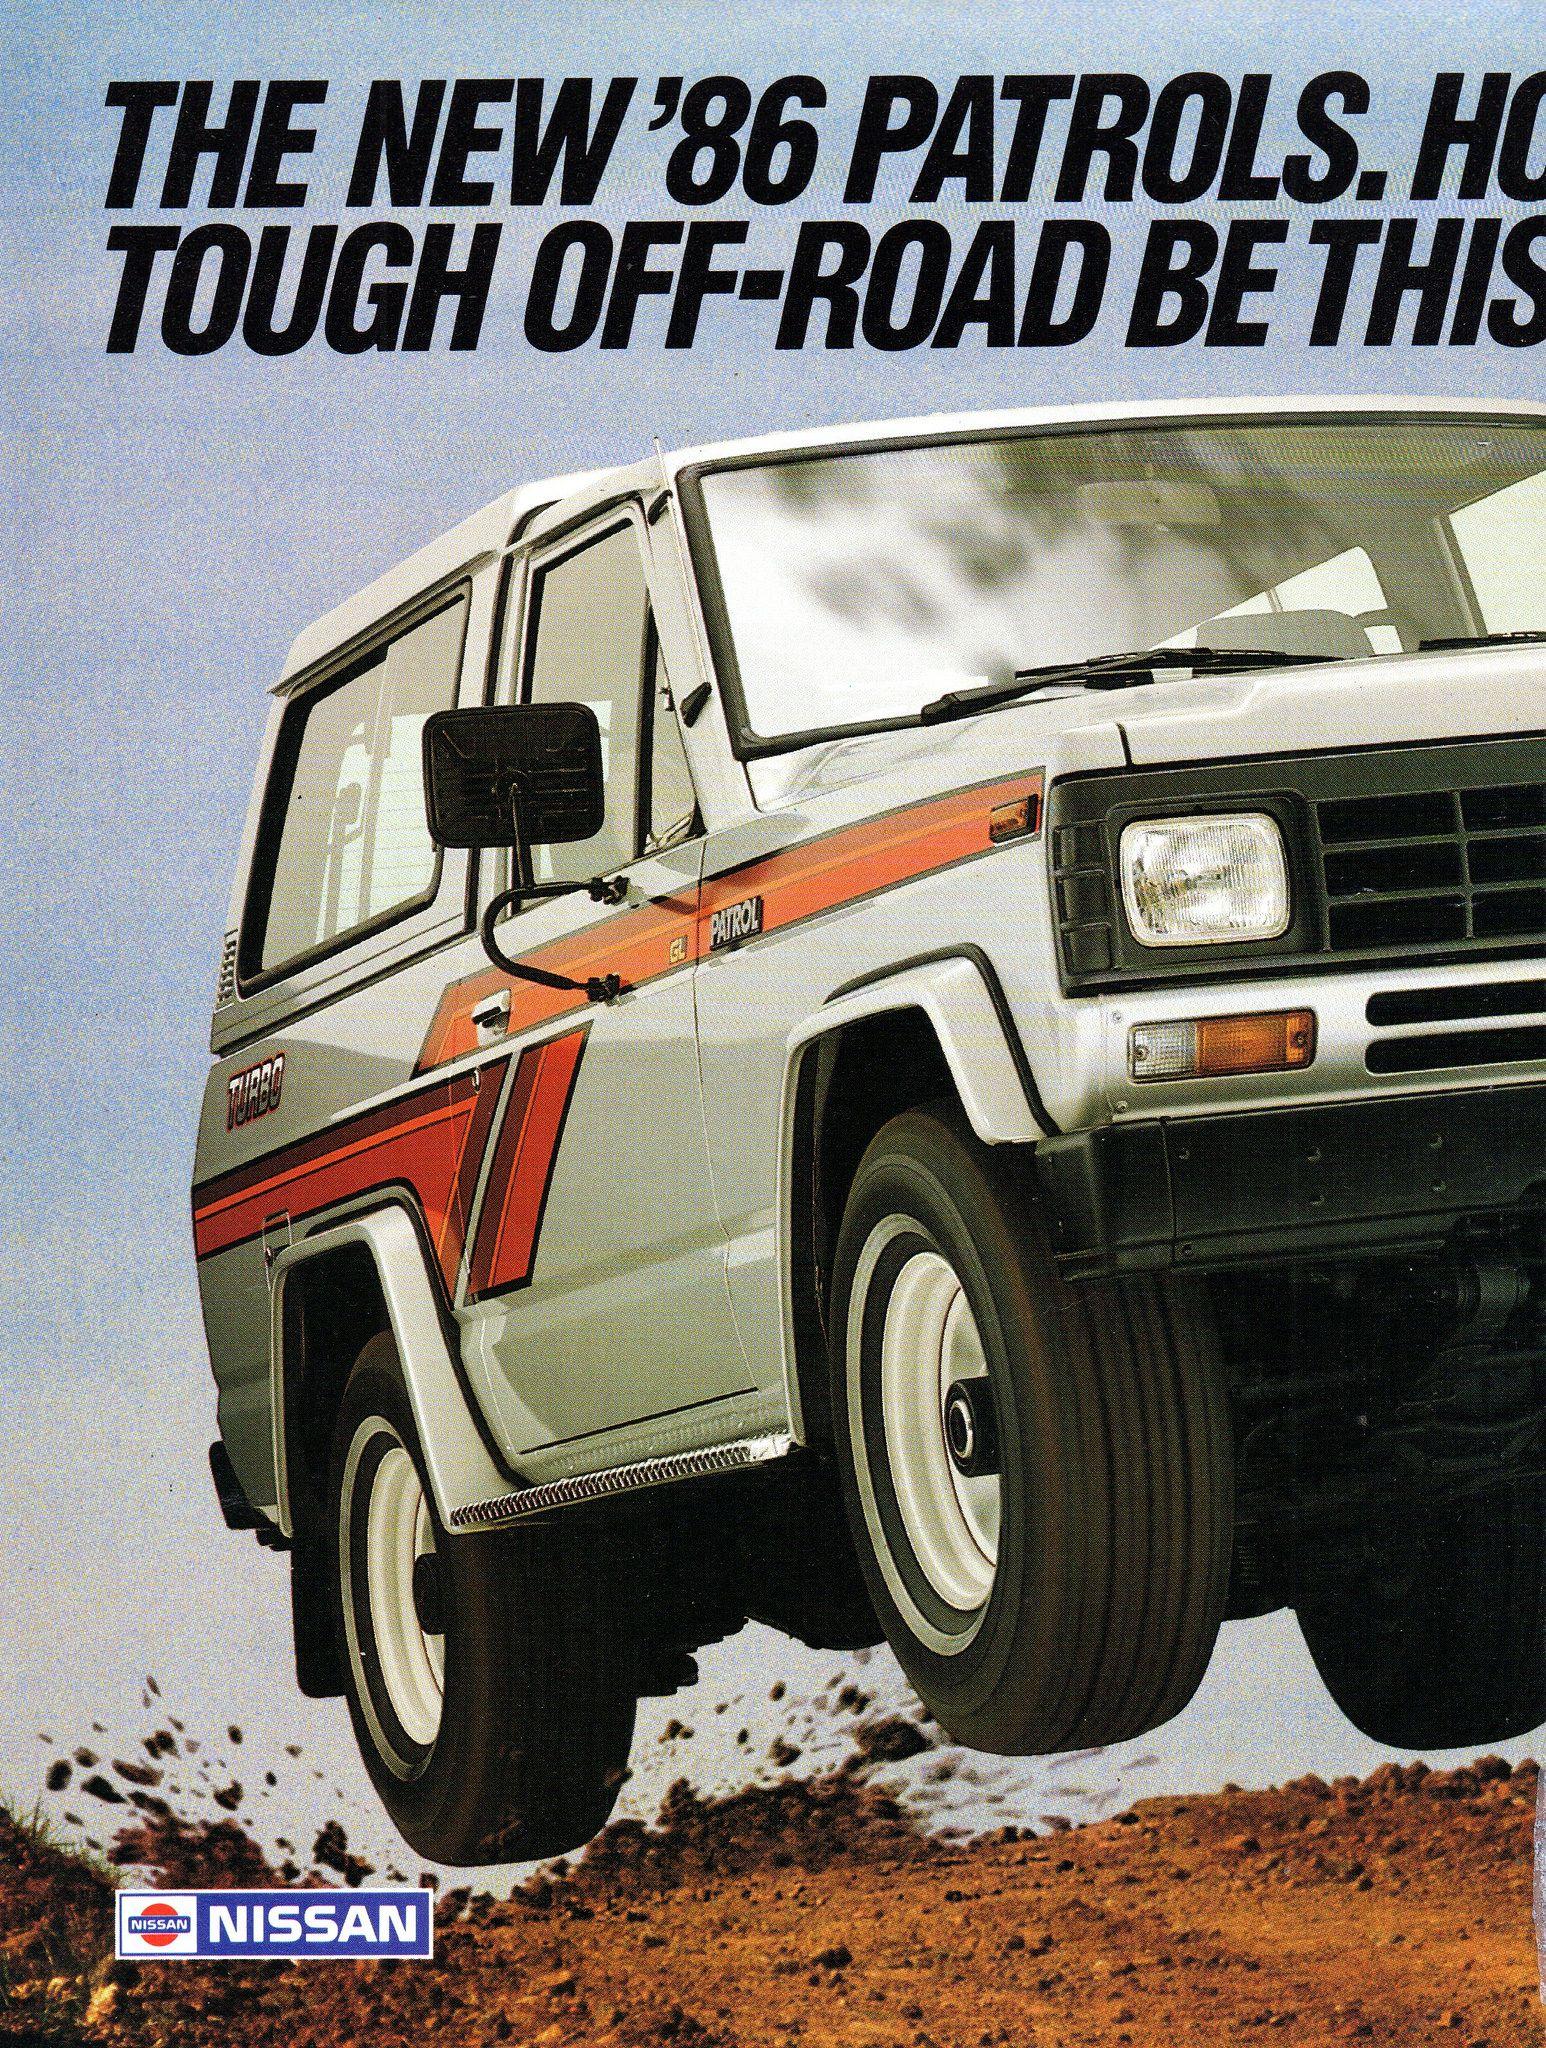 https://flic.kr/p/24mwhp9 | 1986 Nissan Patrol Turbo